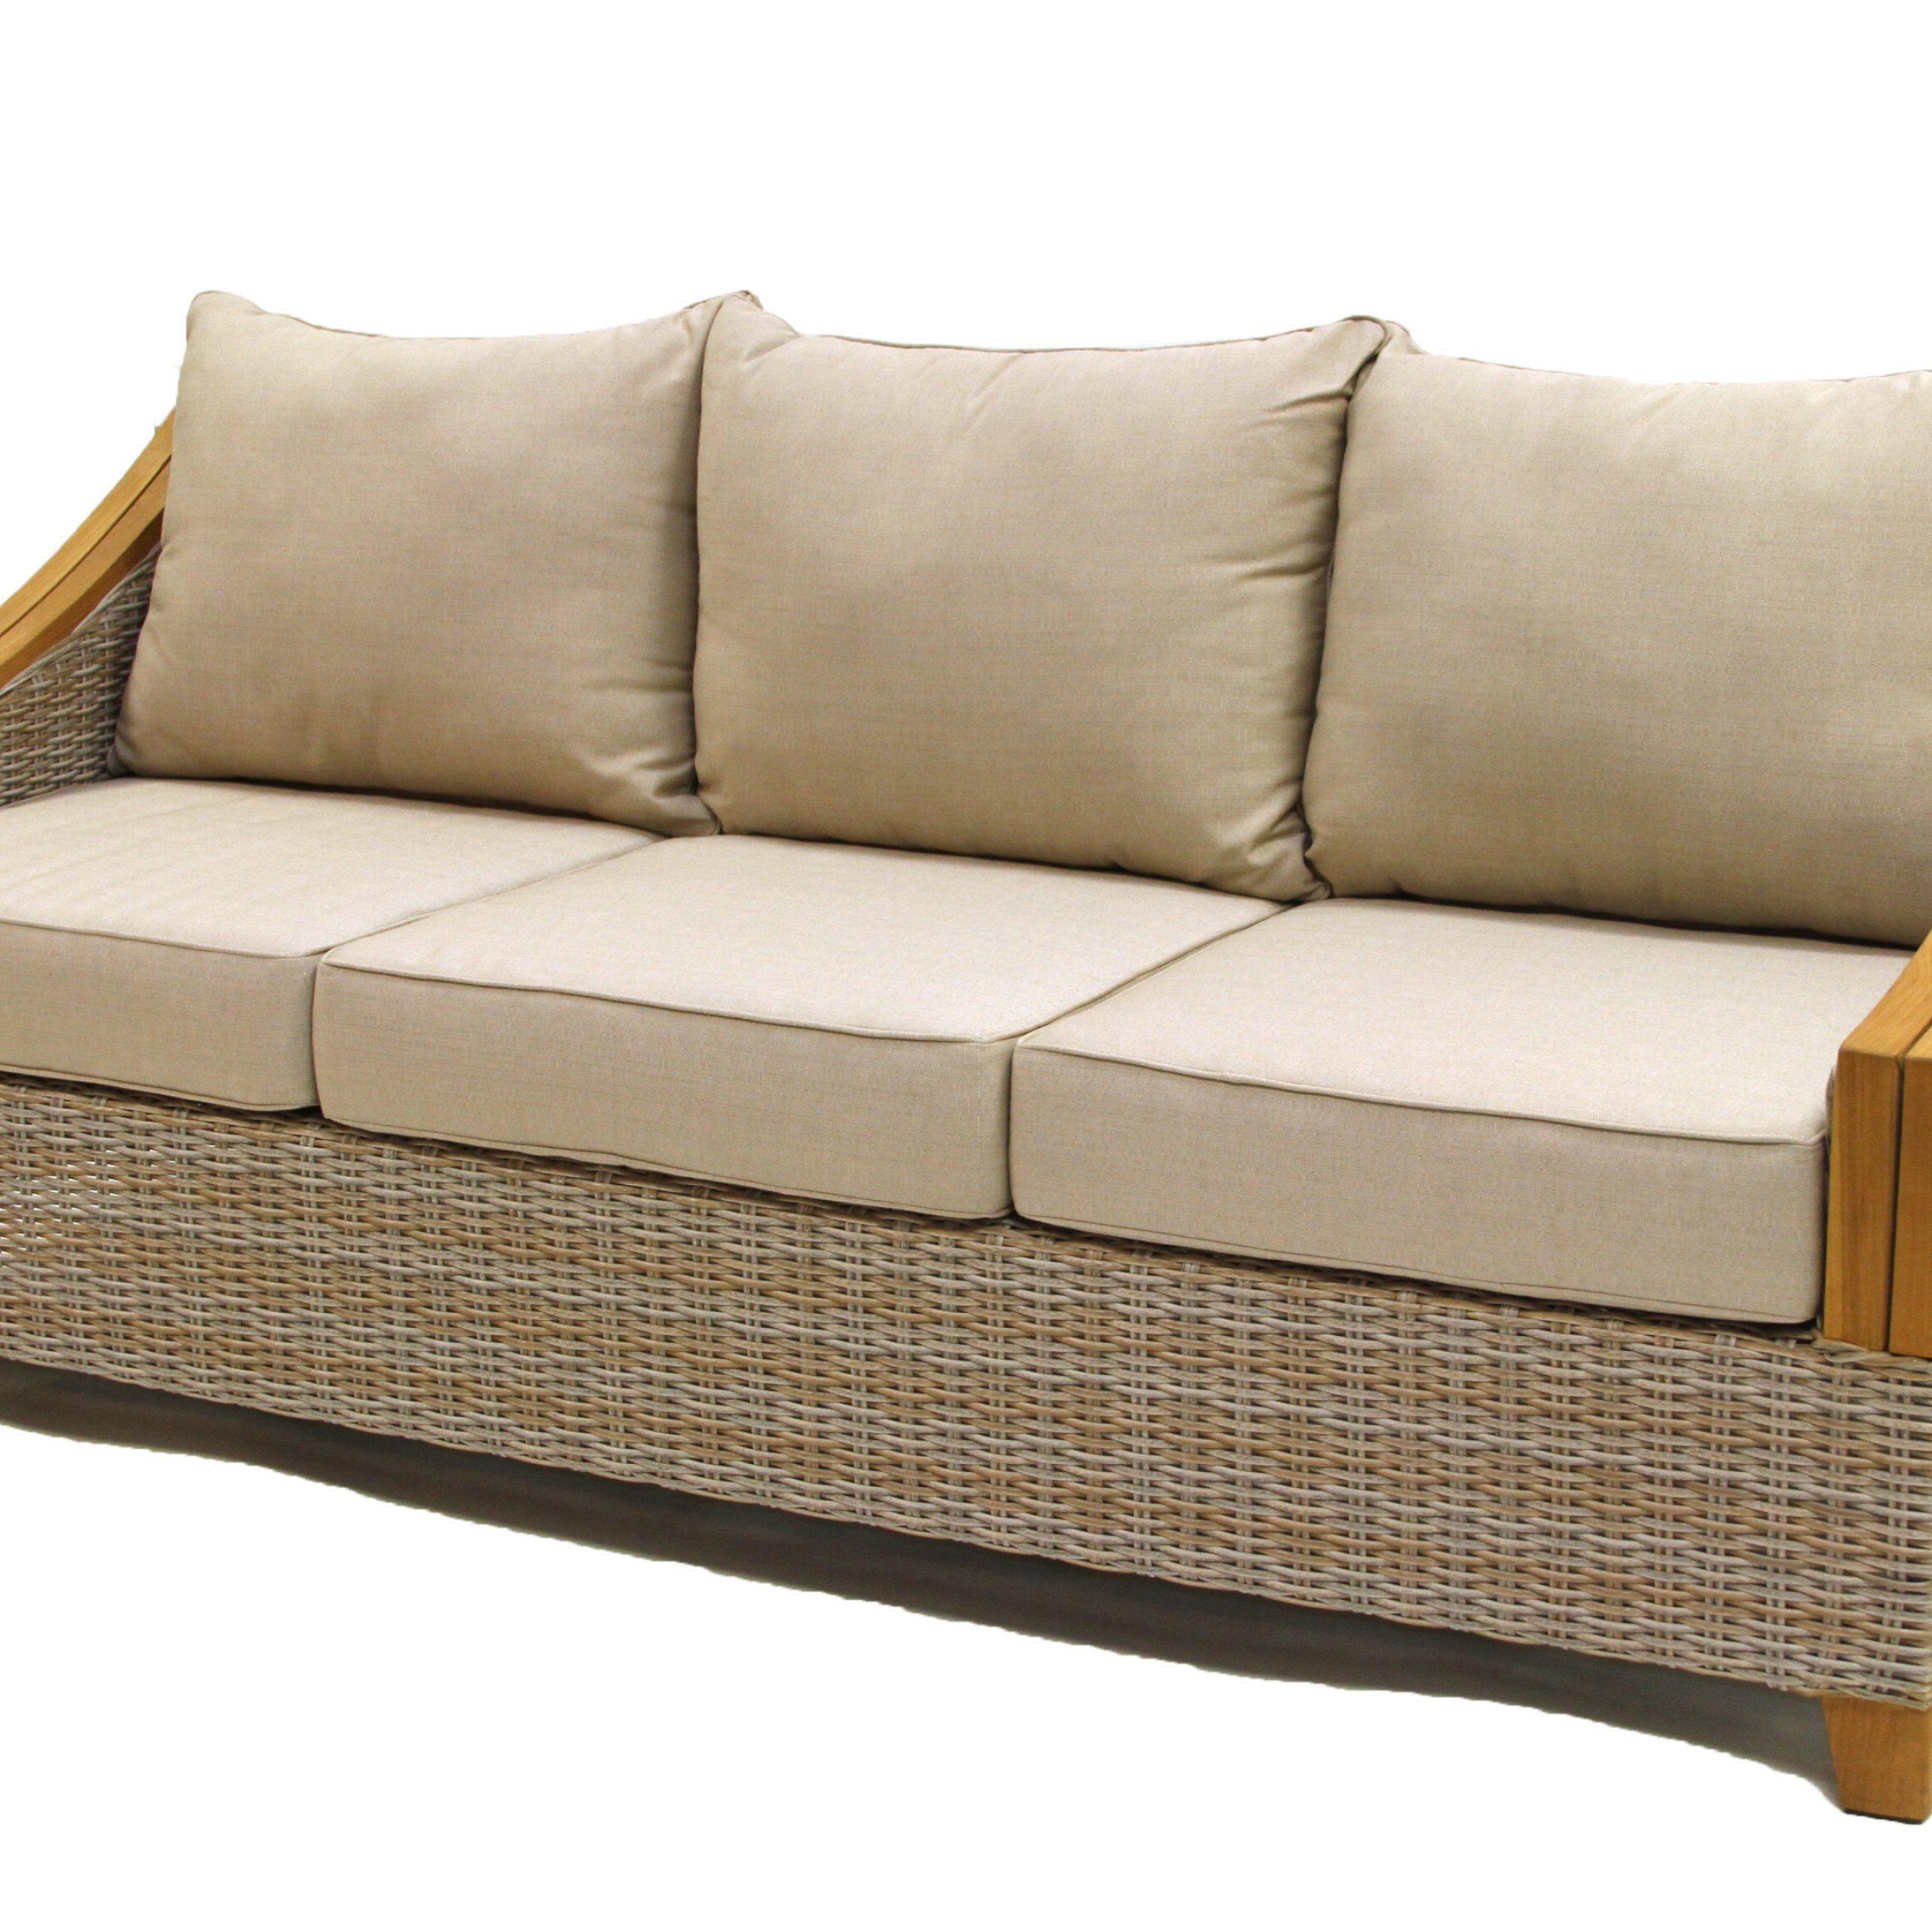 Kincaid Teak Patio Sofa With Sunbrella Cushions Pertaining To Best And Newest Kincaid Teak Patio Sofas With Sunbrella Cushions (Gallery 2 of 25)